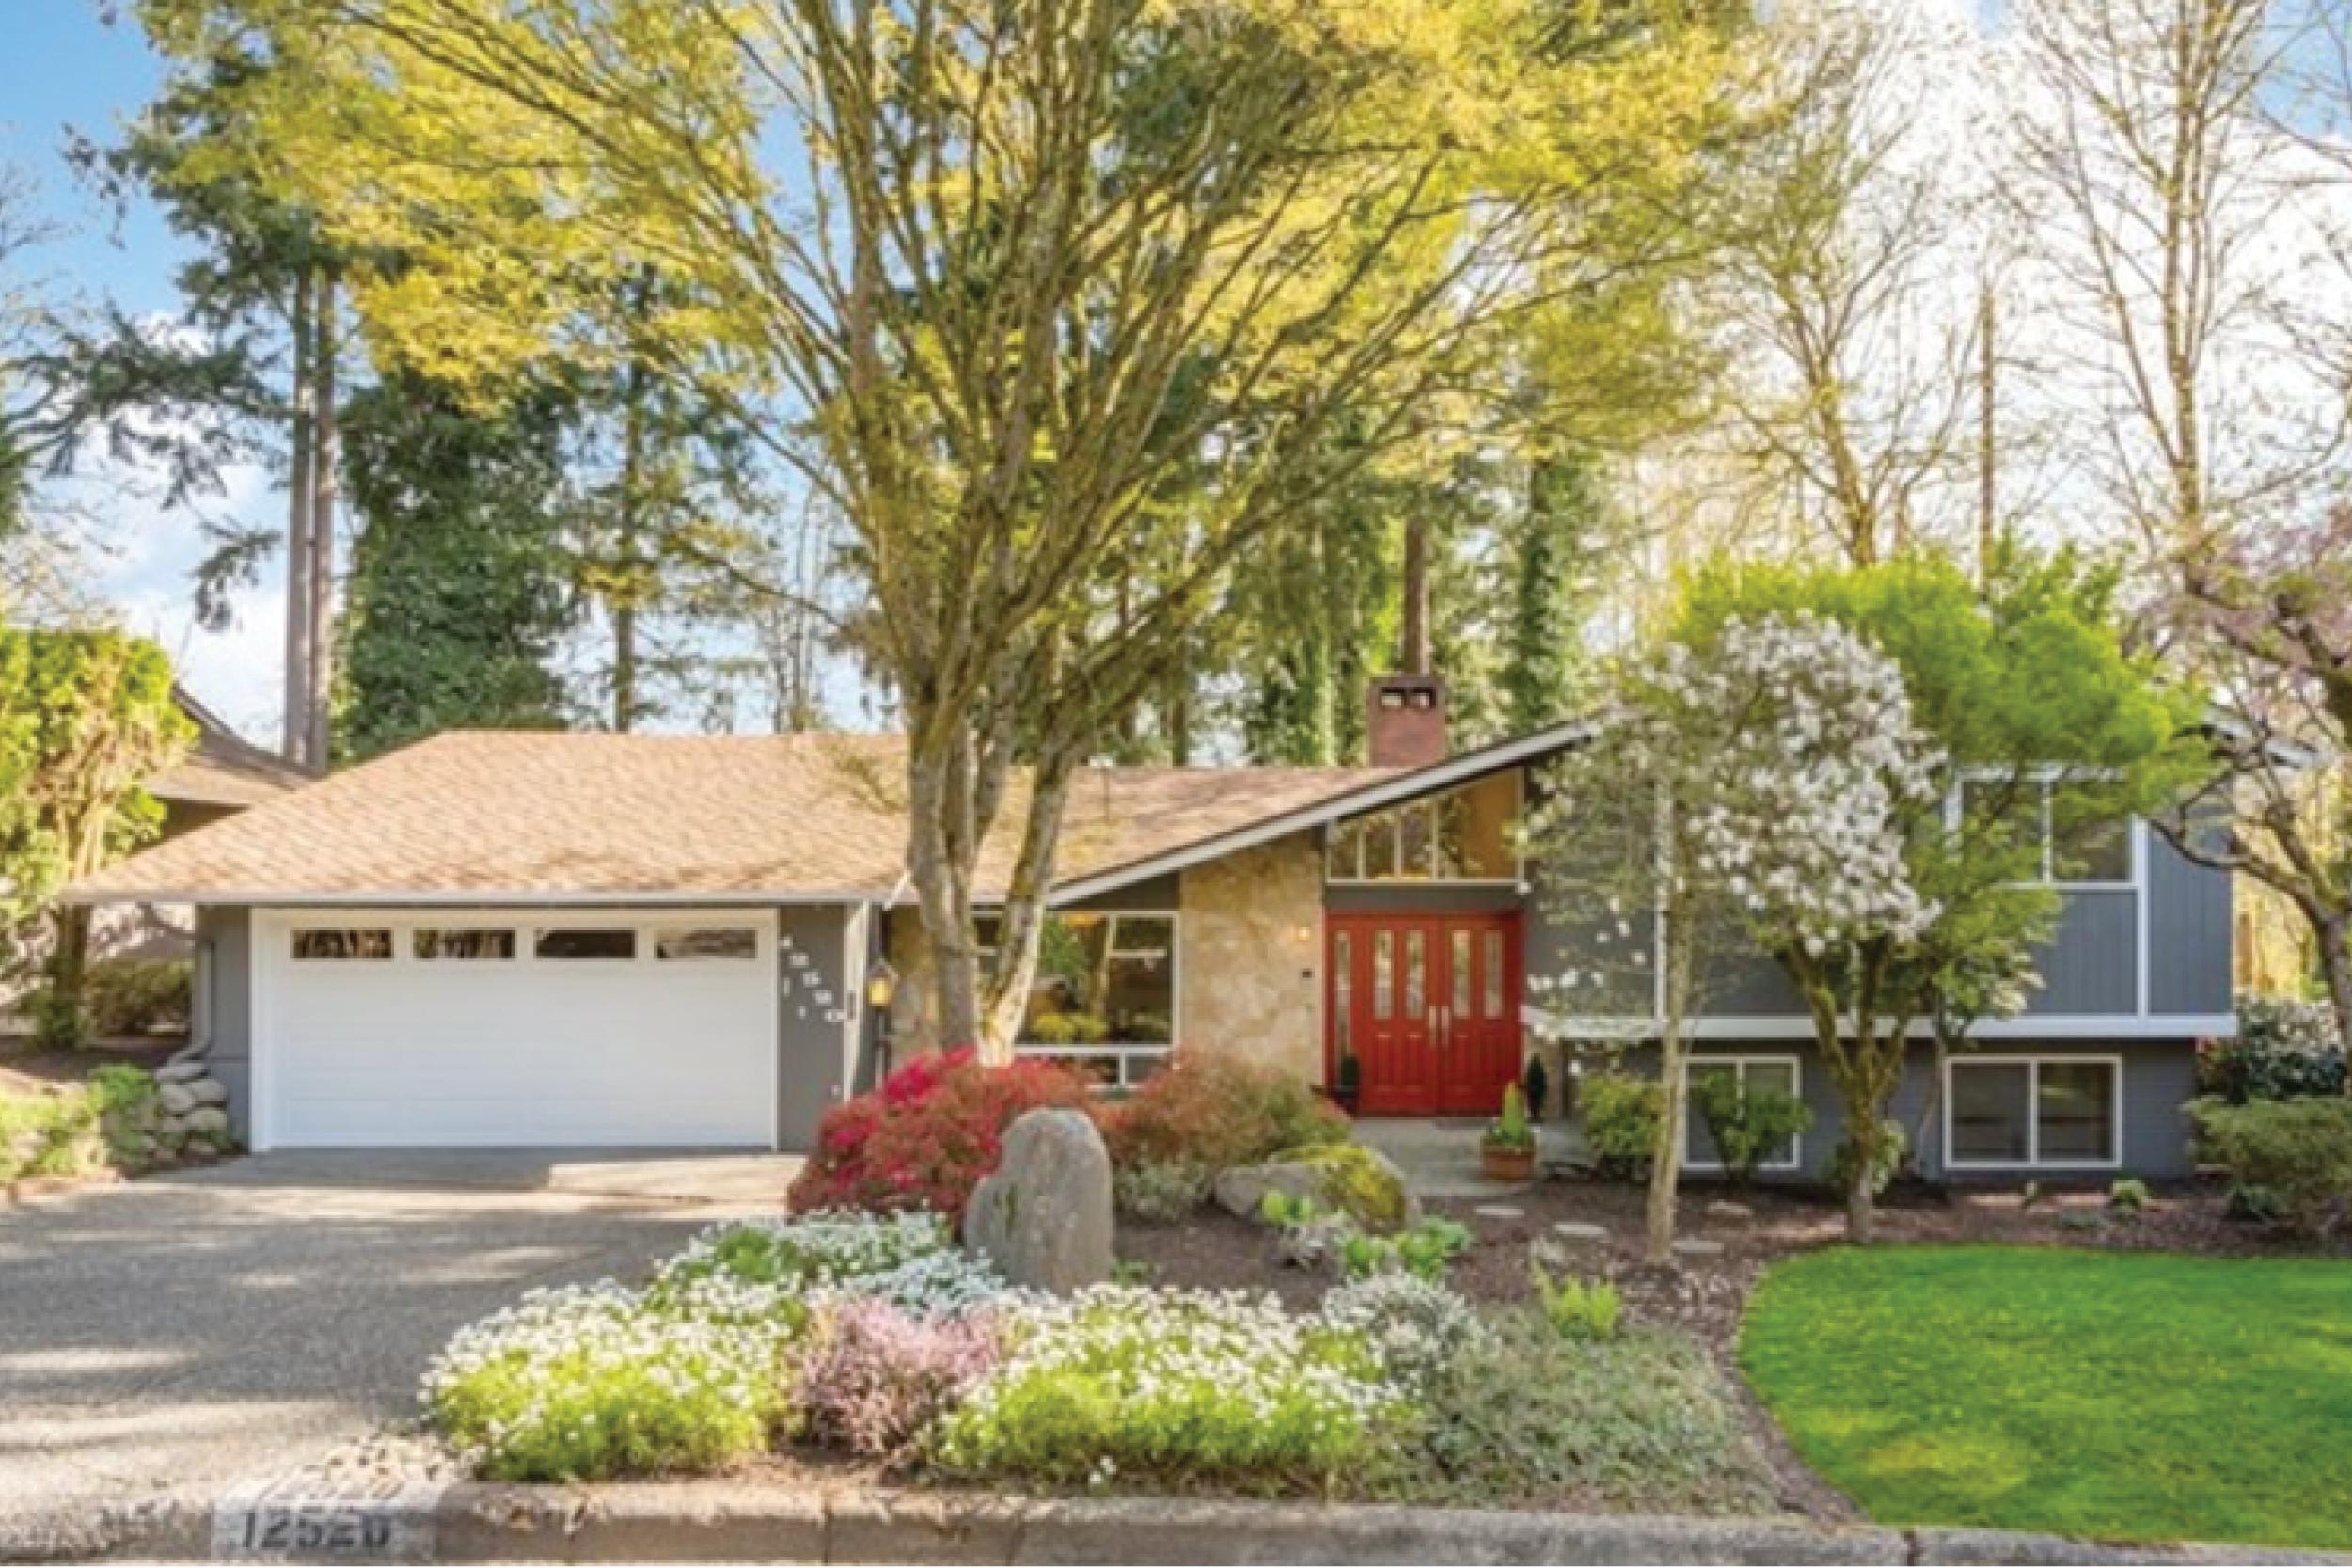 East Bellevue    Sold for $1,200,000 June 2017